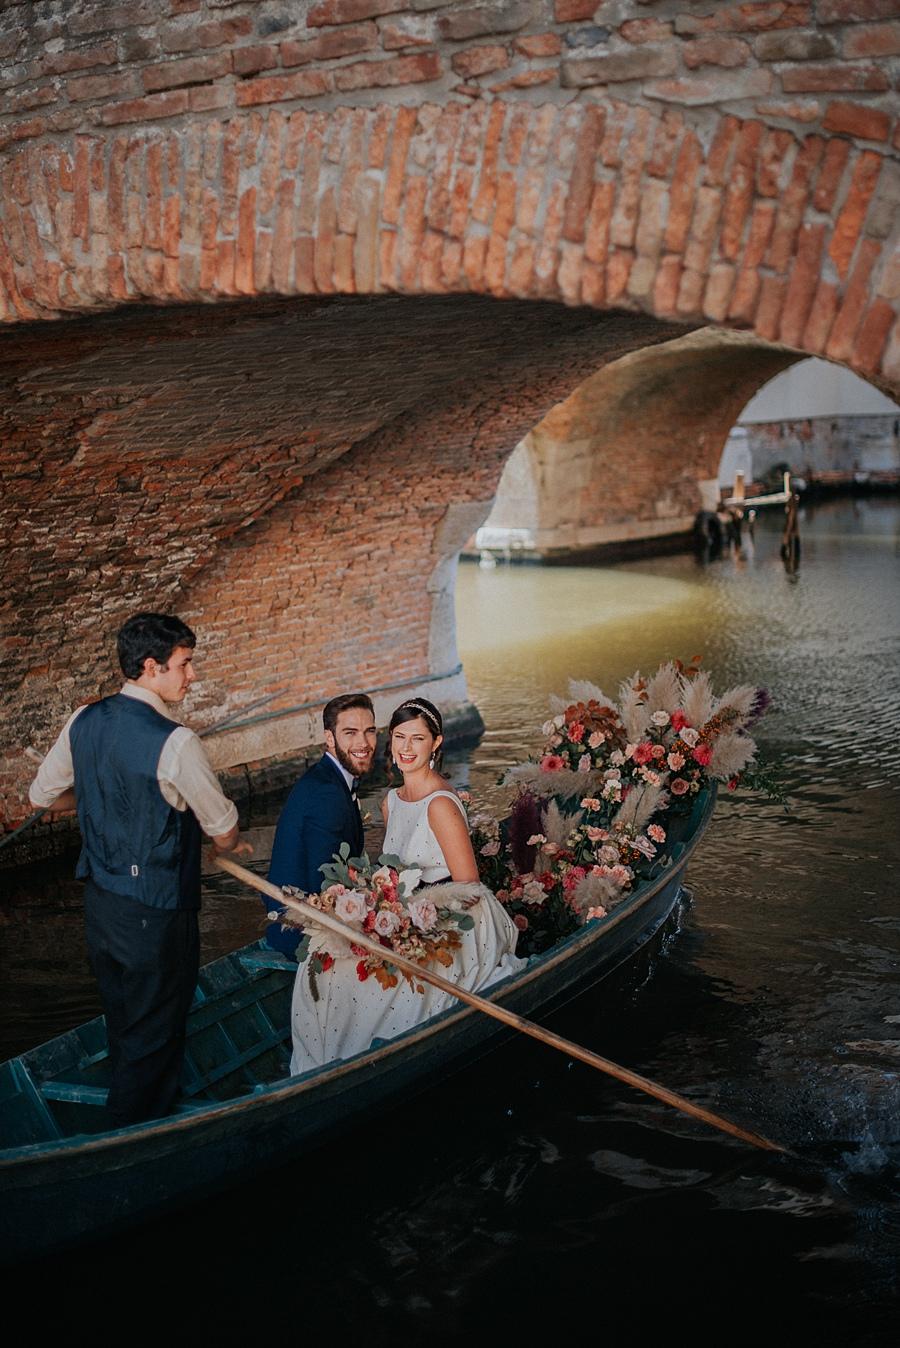 Italian Gondola Wedding Ceremony Getaway